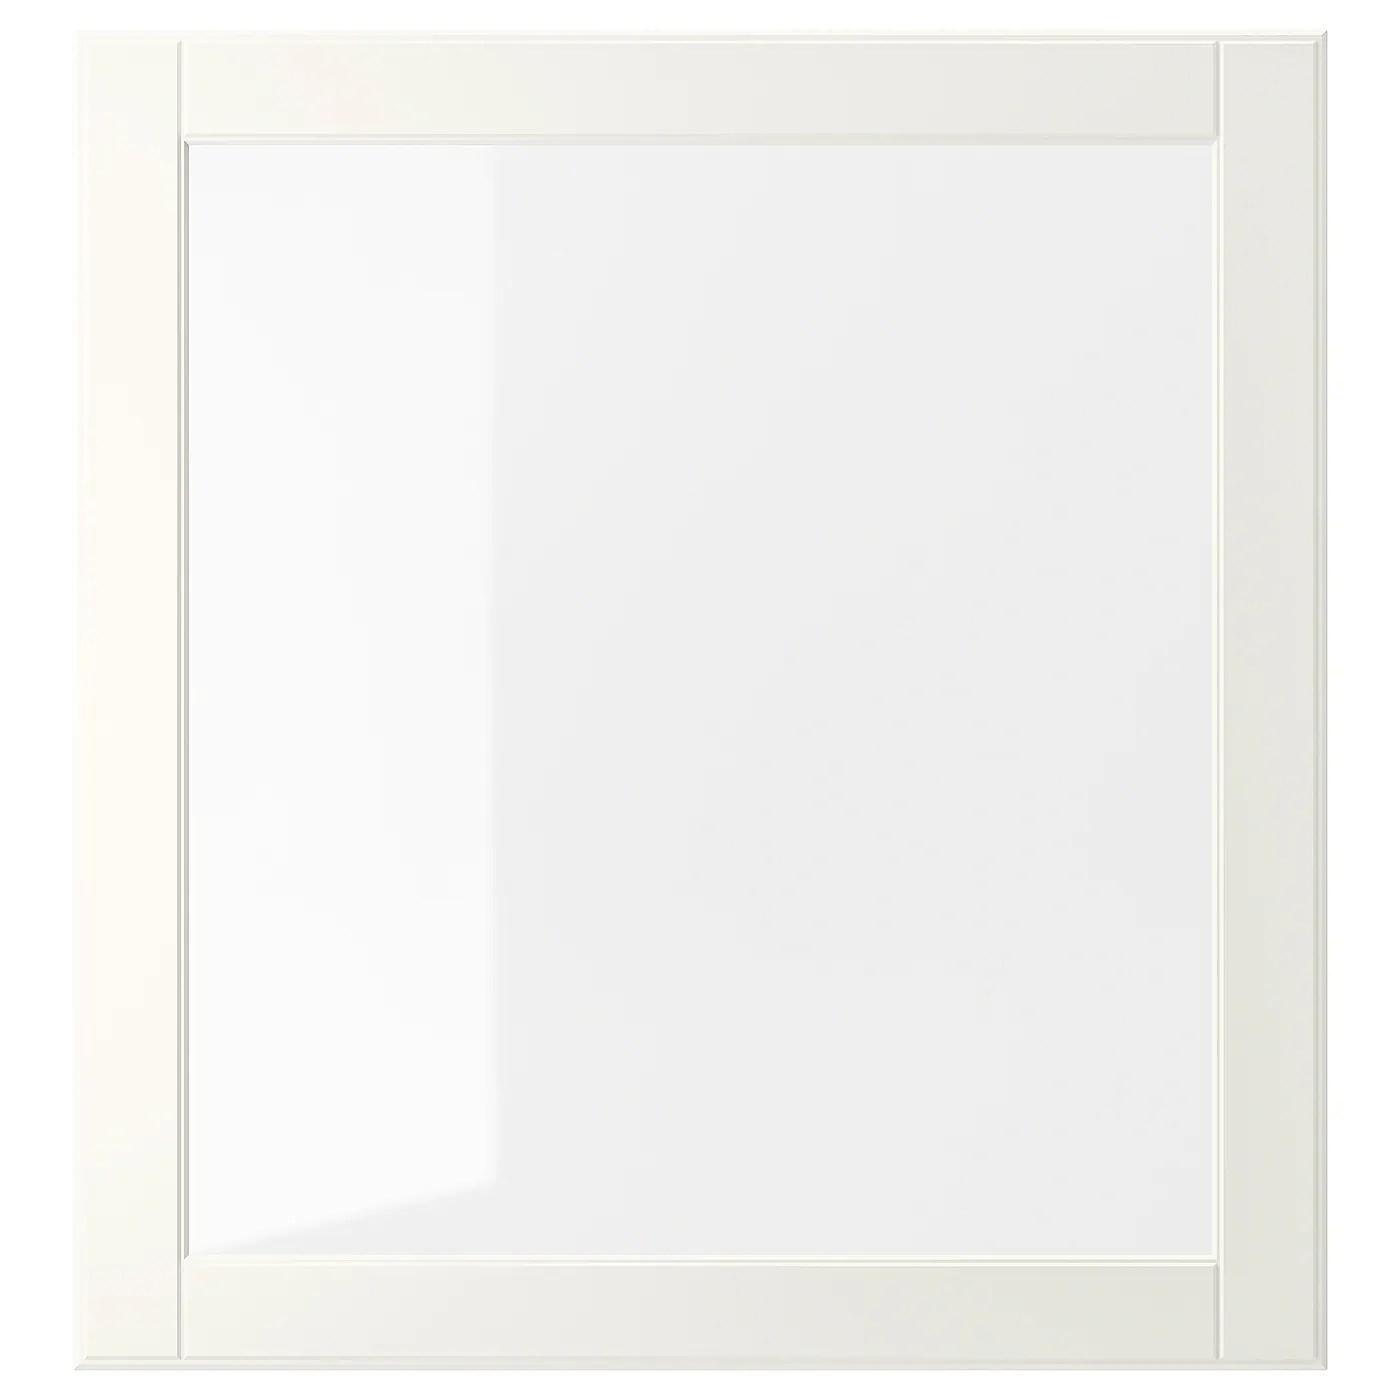 ostvik porte vitree blanc verre clair 23 5 8x25 1 4 60x64 cm